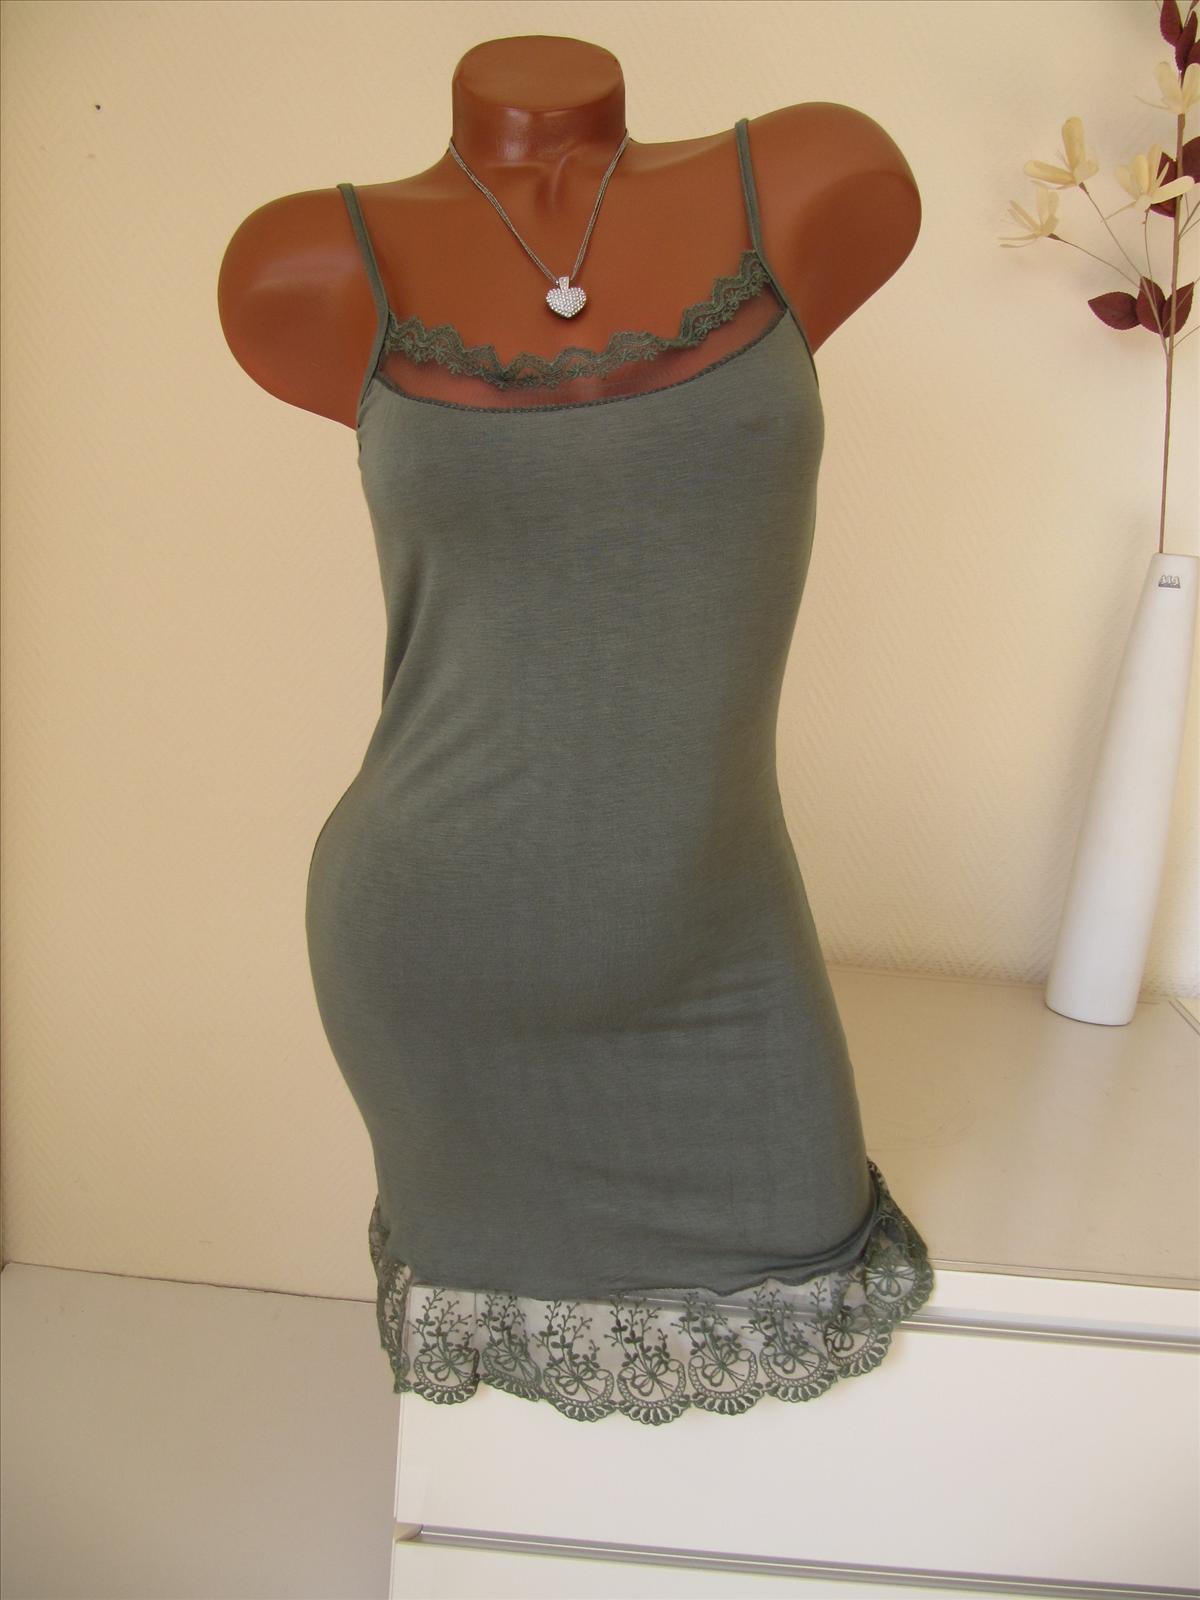 Unterkleid Tunika Kleid Shirt Top Spitze Volant ...